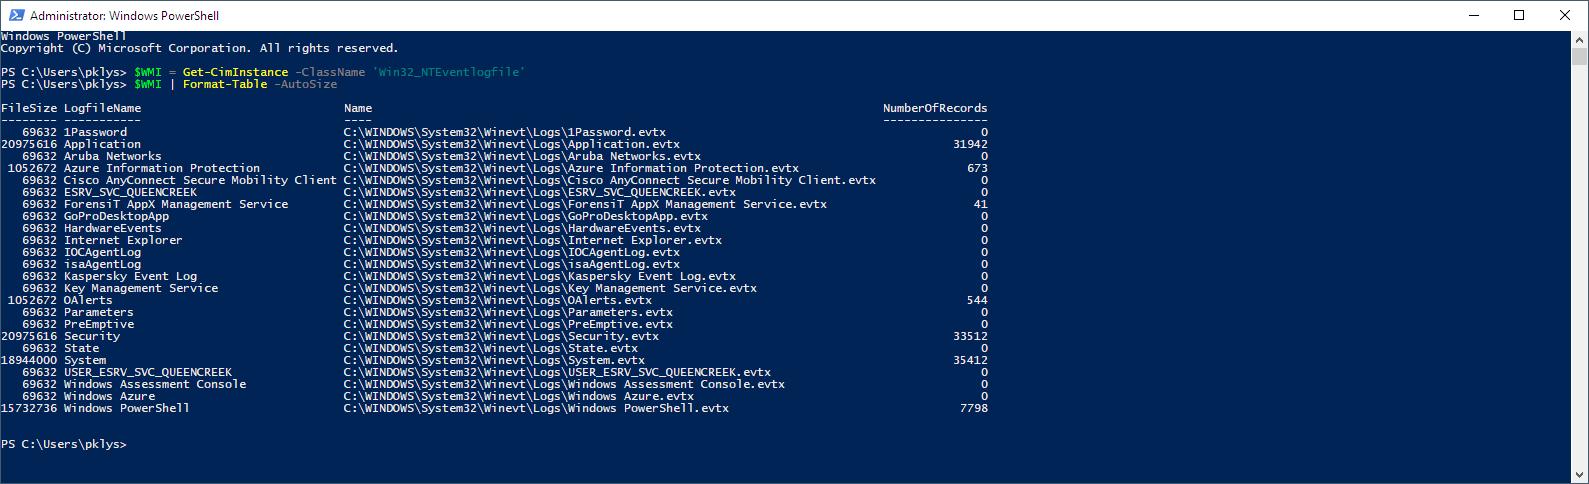 Get-CimInstance -ClassName 'Win32_NTEventlogfile'